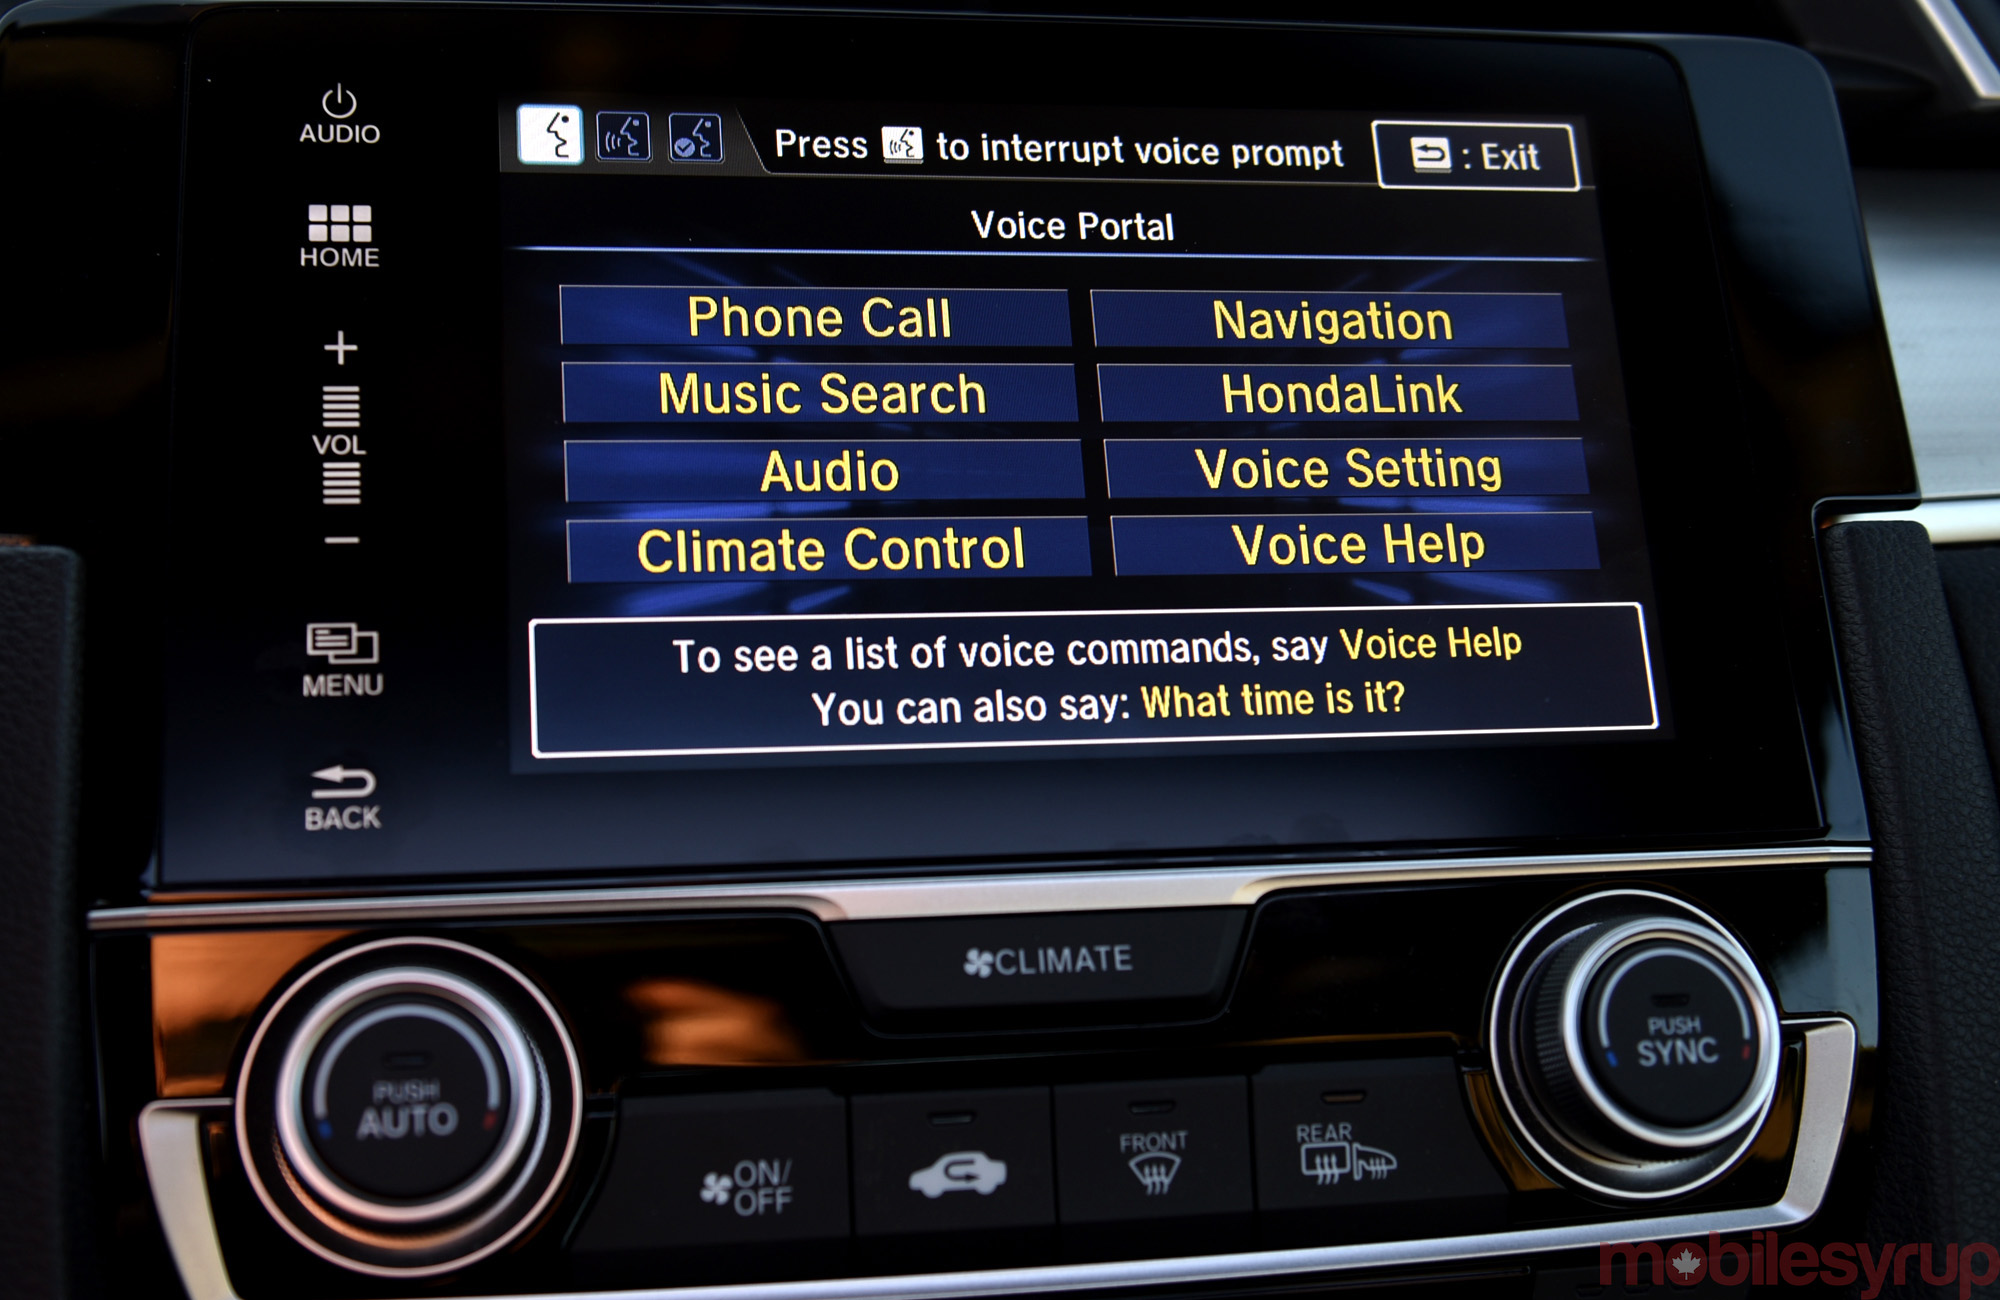 HondaLink voice menu